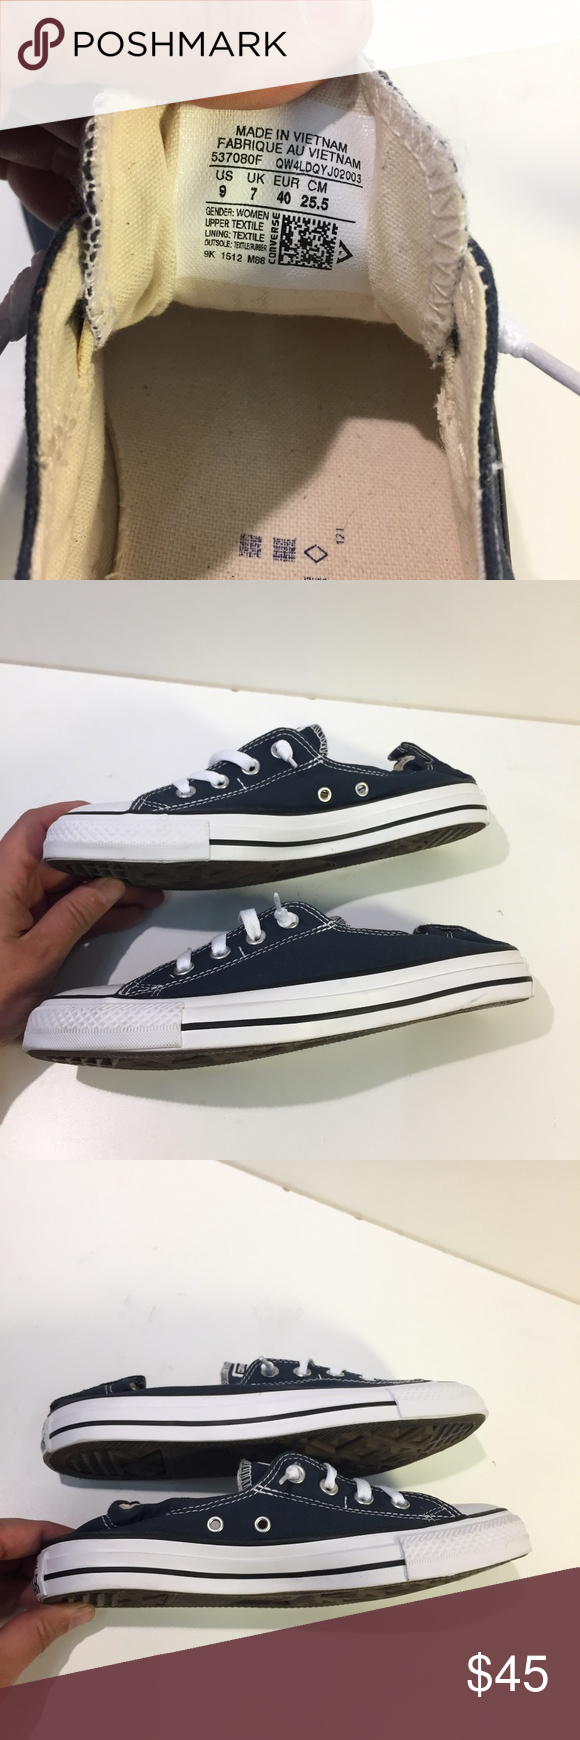 Converse Chuck Taylor Shoreline Slip On Shoes Women's